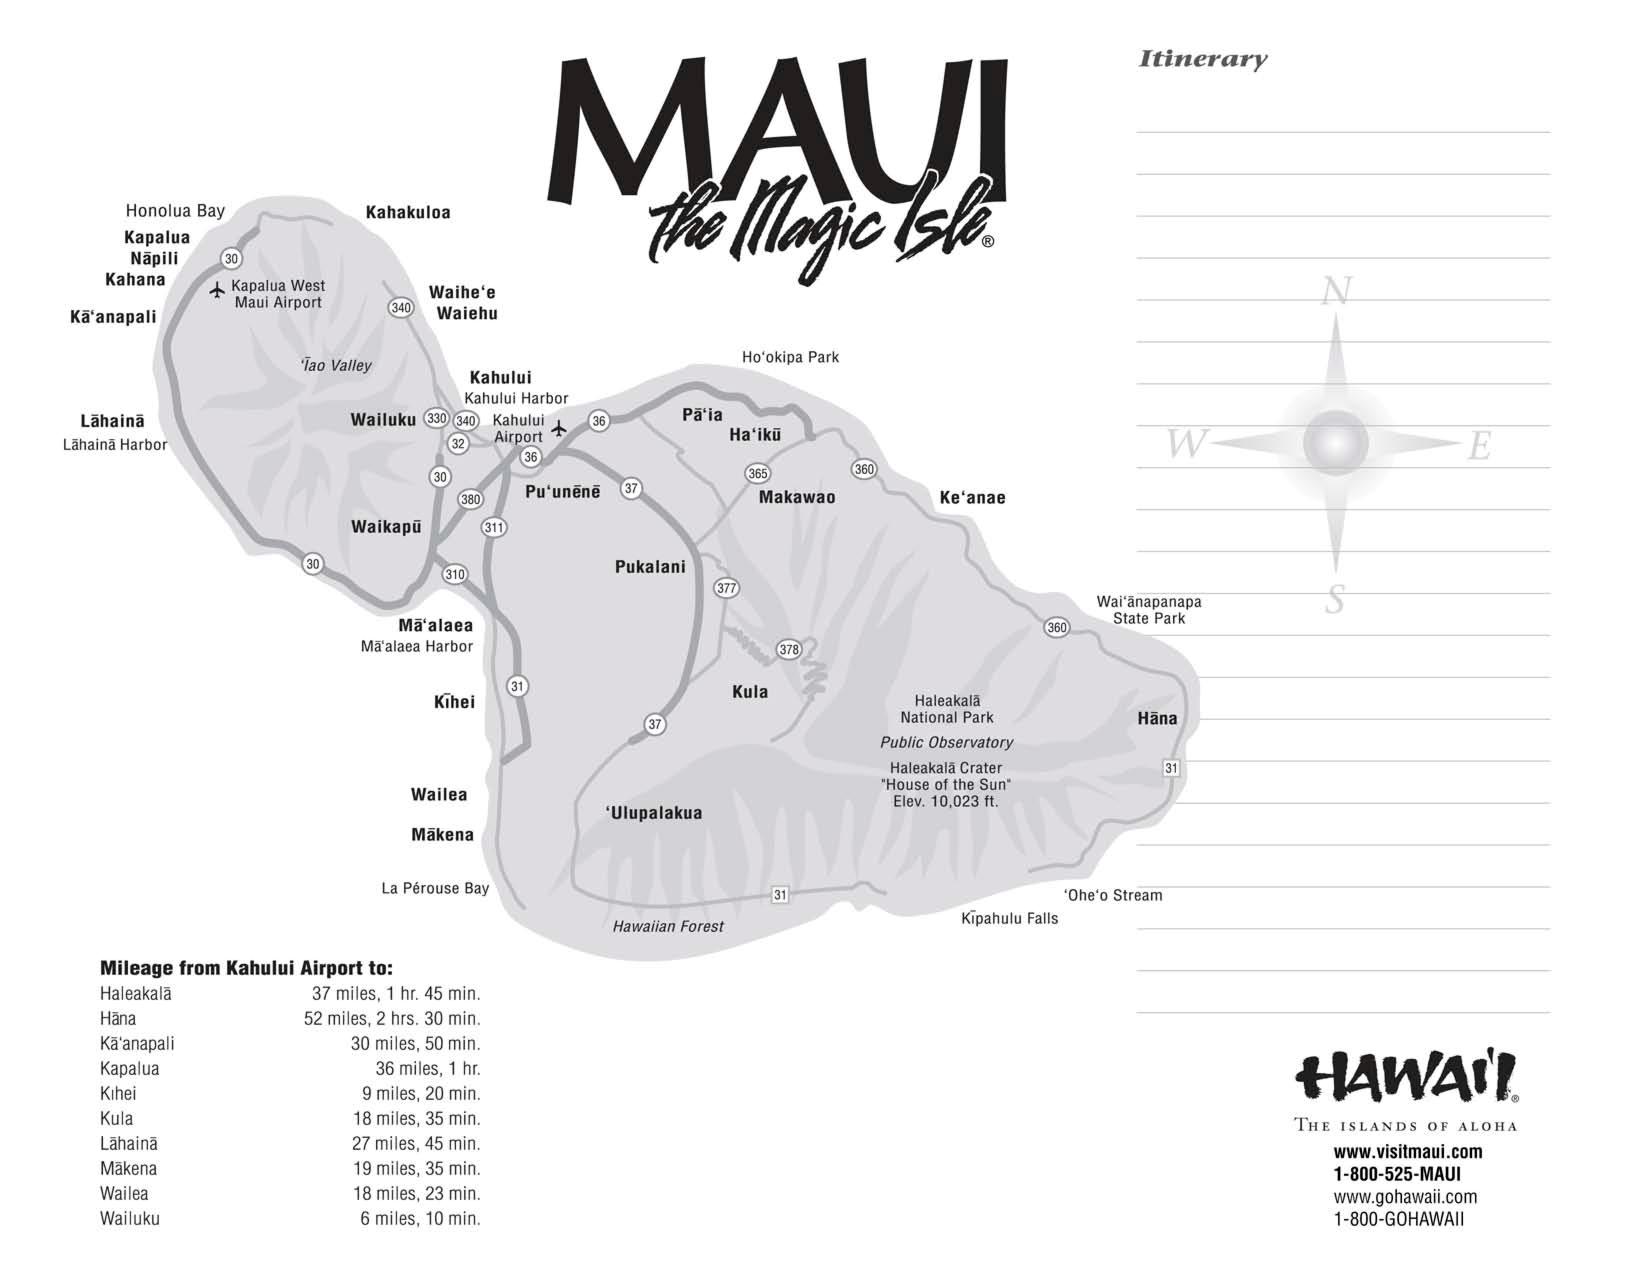 Maui maps printable printable maui hiking maps best maui hikes maui maps printable printable maui hiking maps best maui hikes best maui hikes hawaii pinterest hawaii trail maps and maui hawaii altavistaventures Images